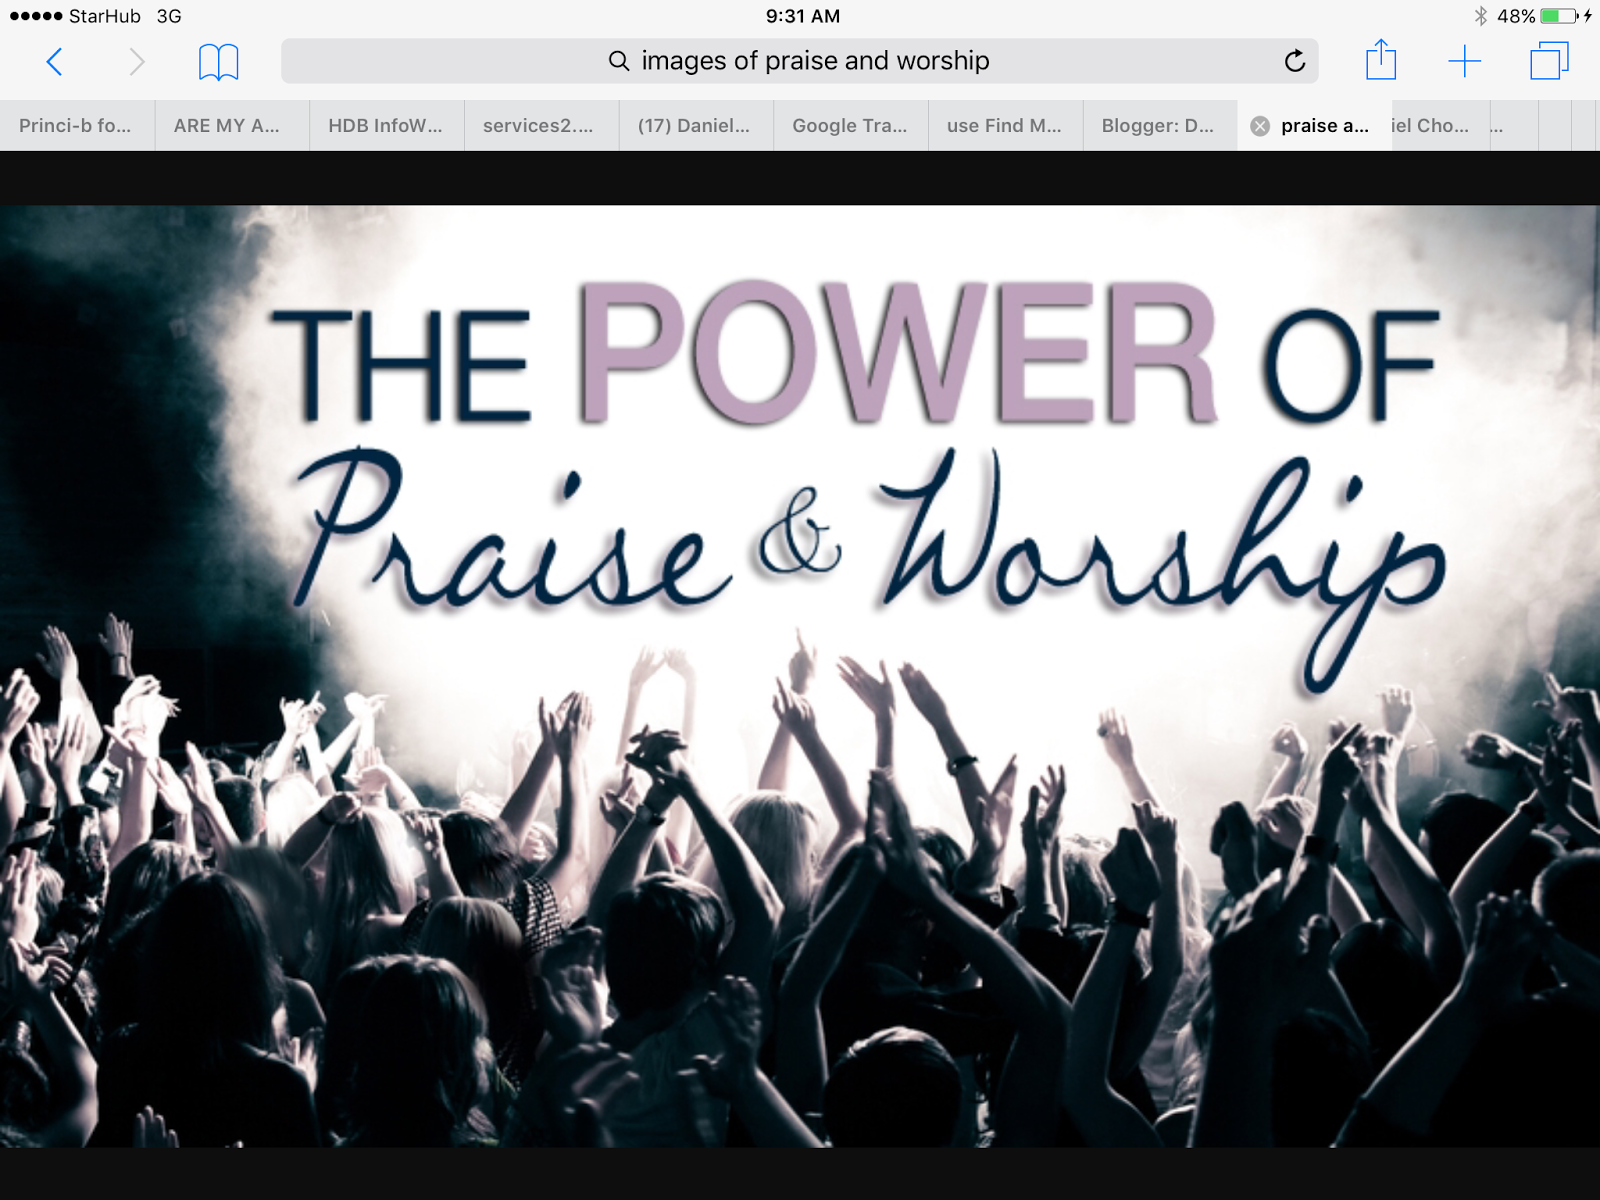 Praise & Worship Content Page